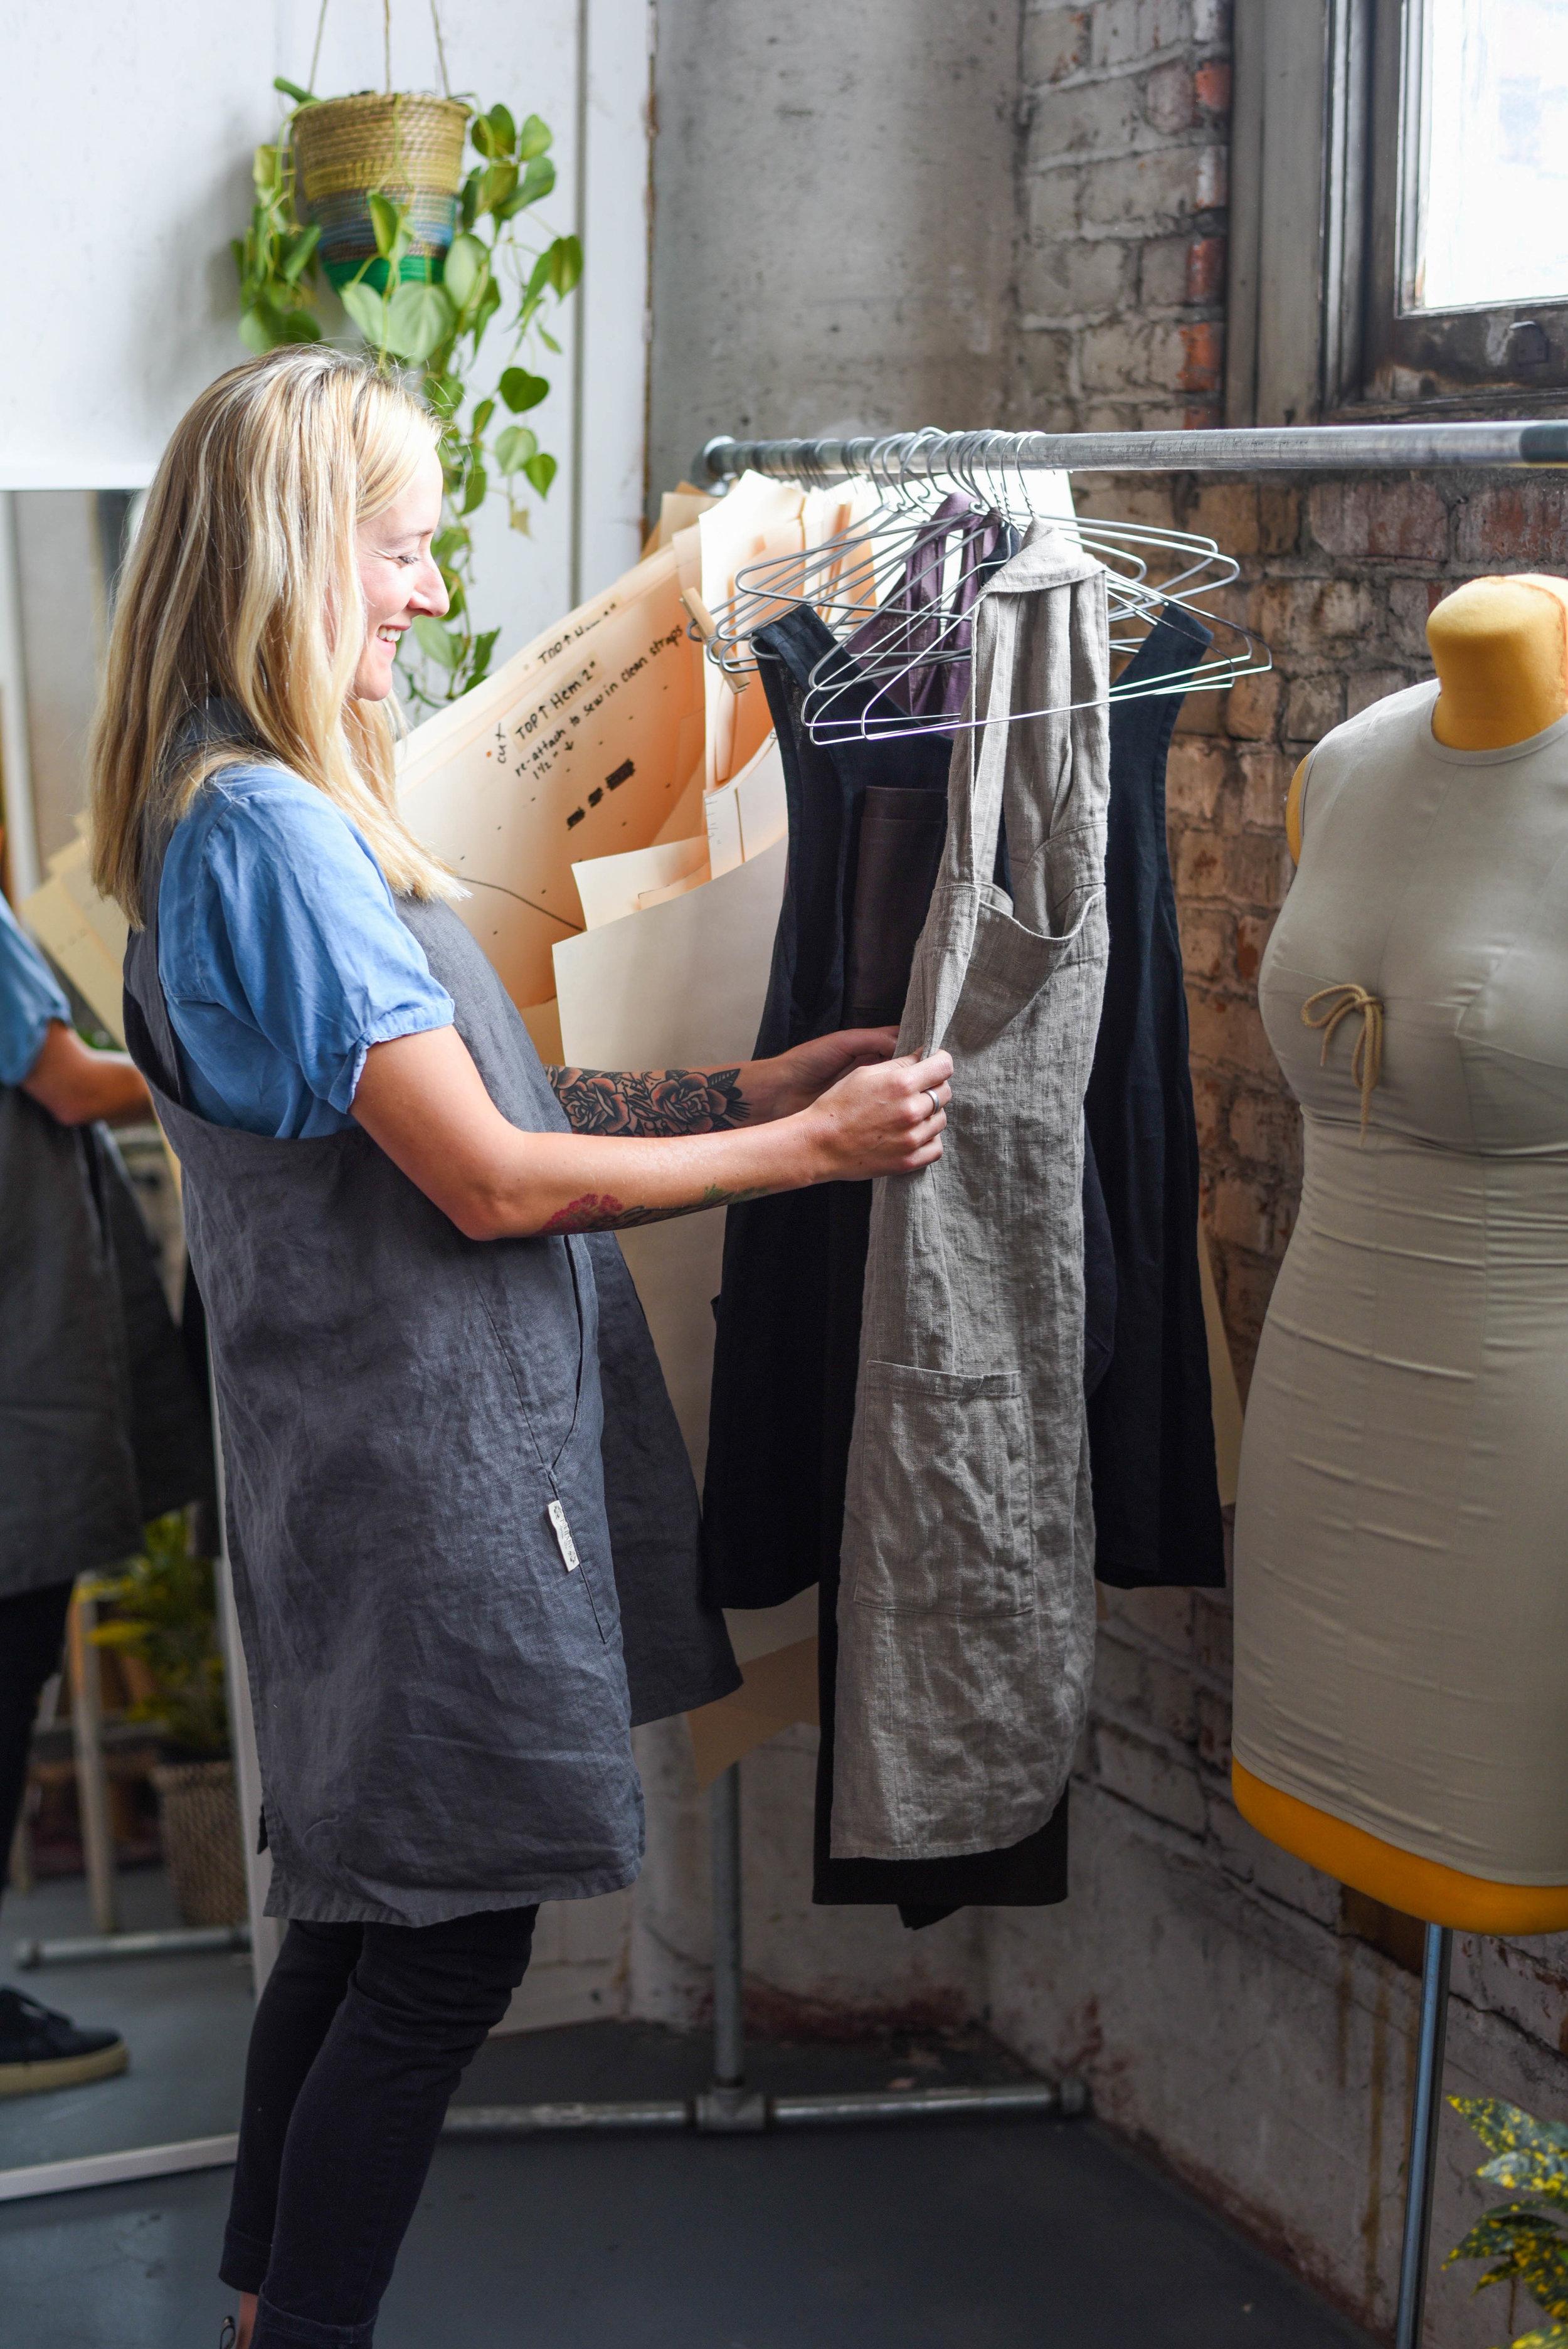 portland apron company-31.jpg